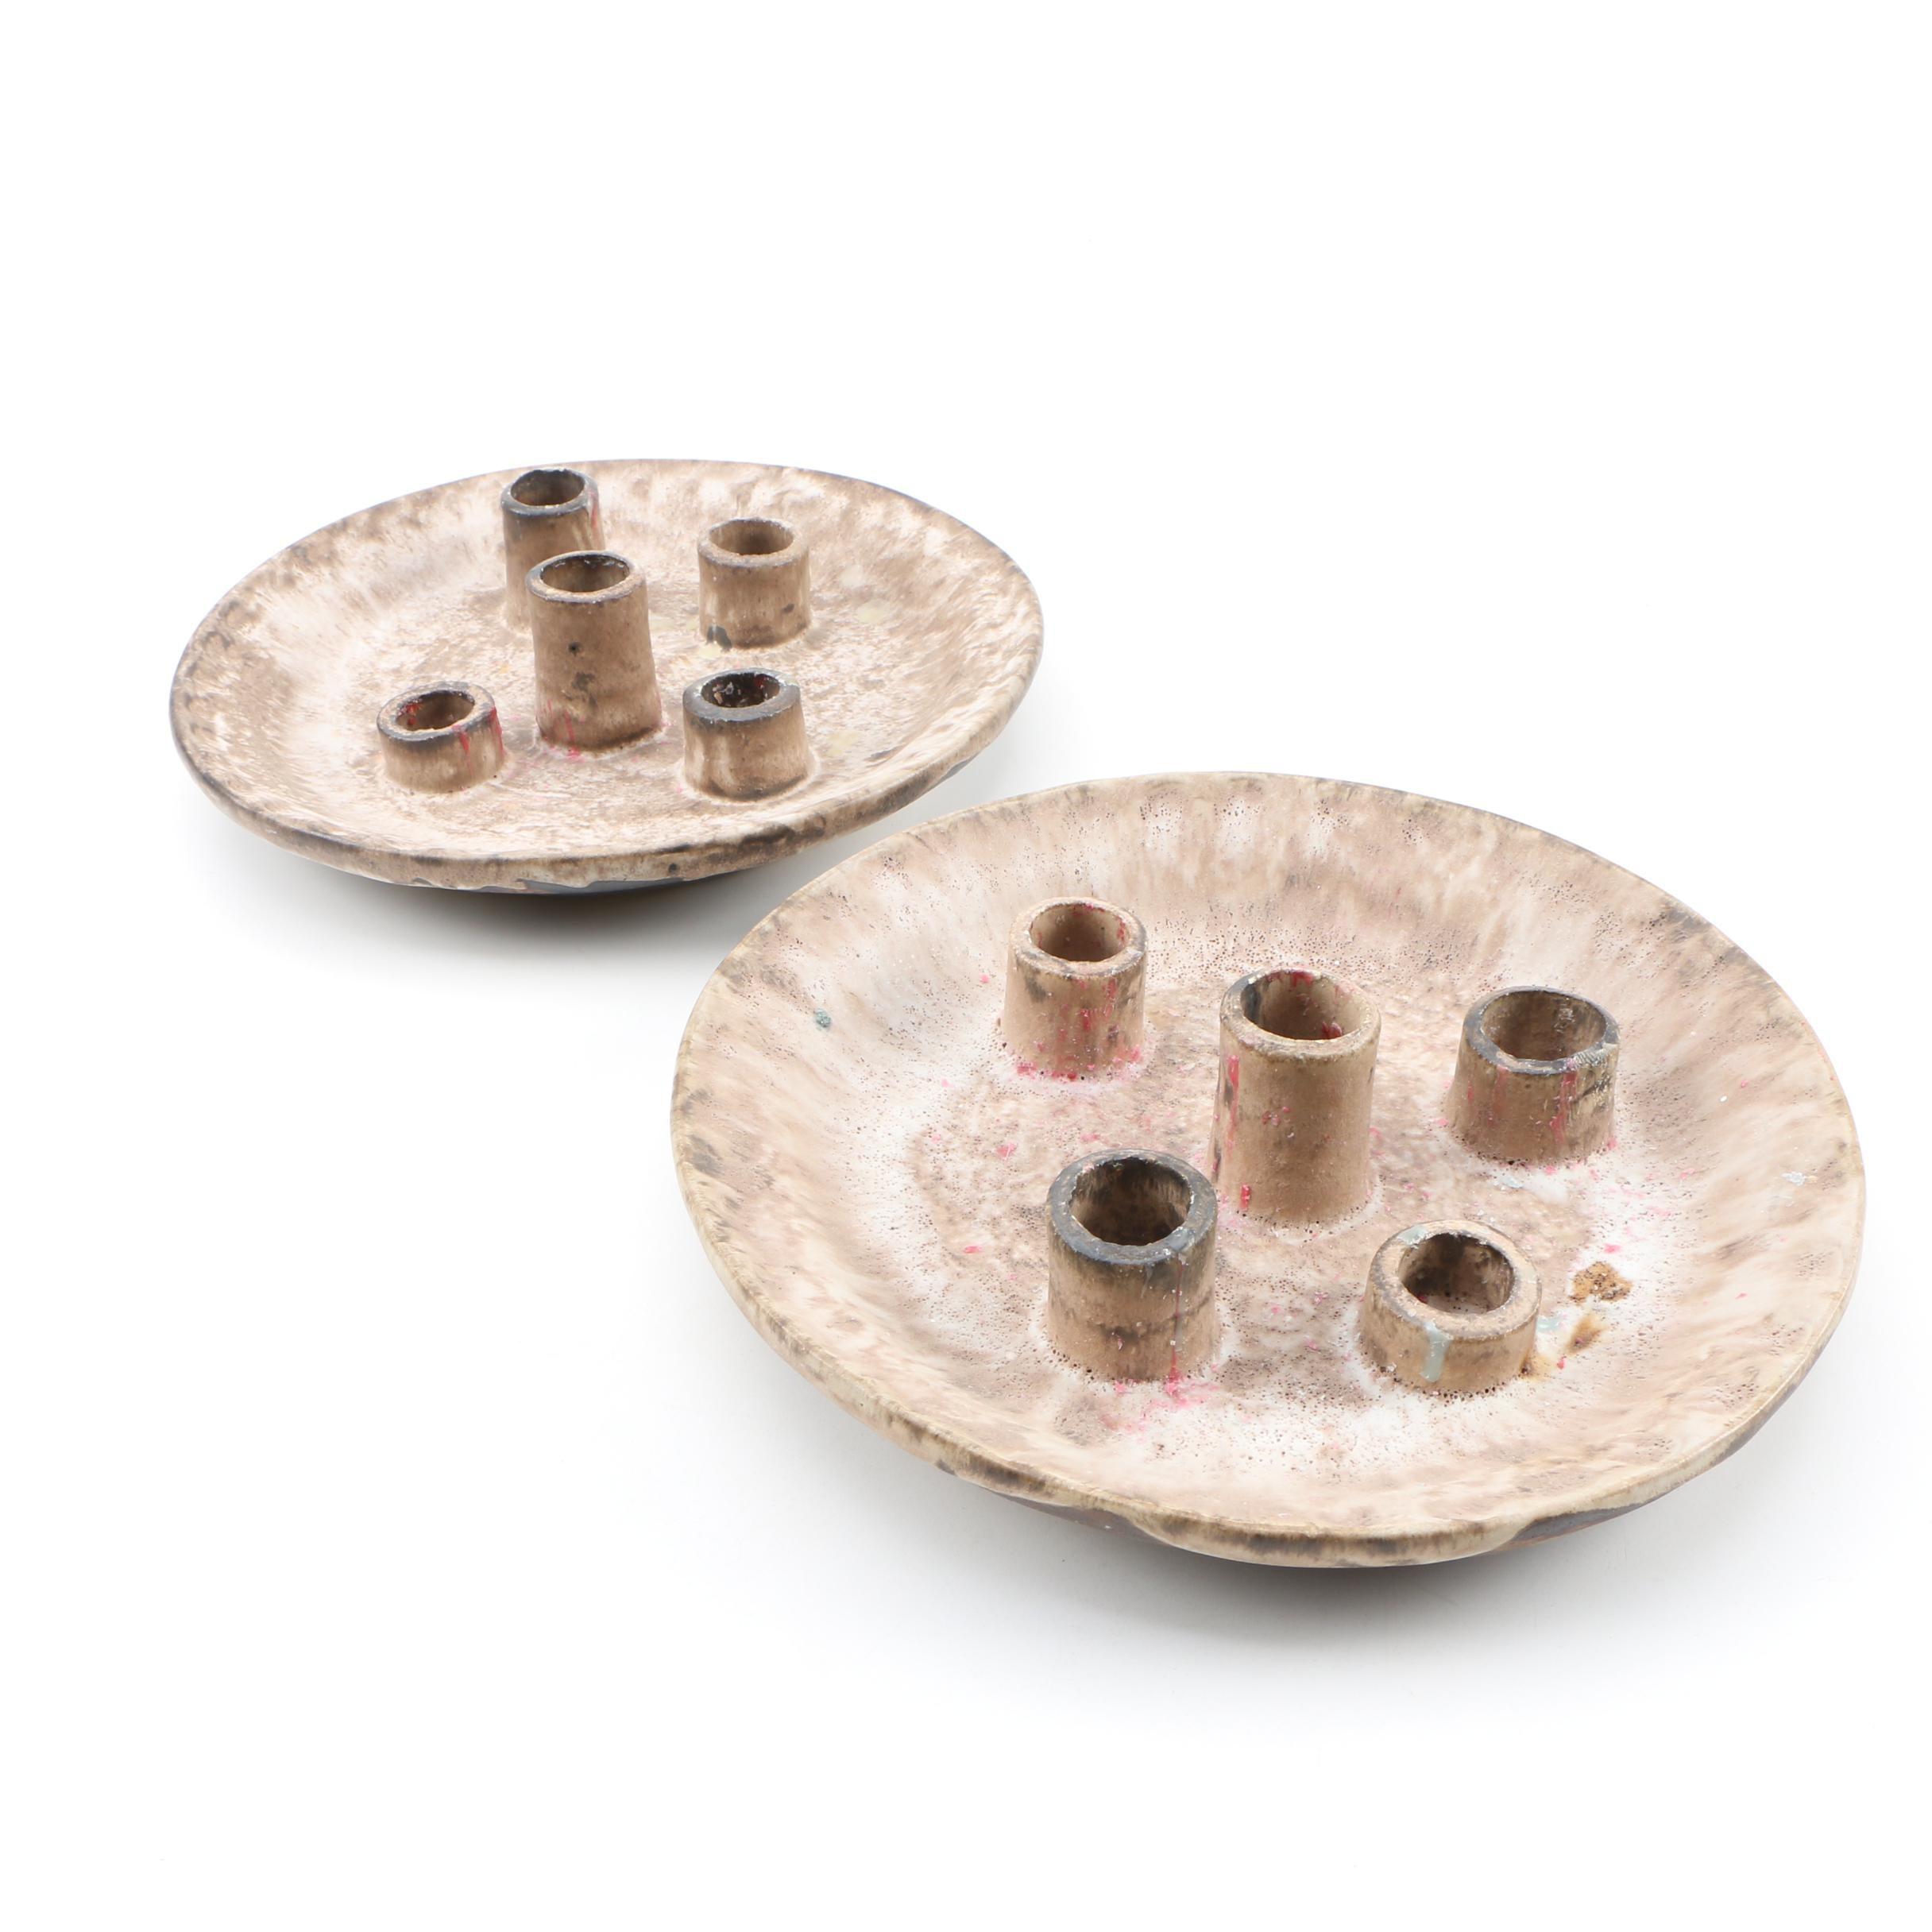 Thrown Stoneware Candleholders